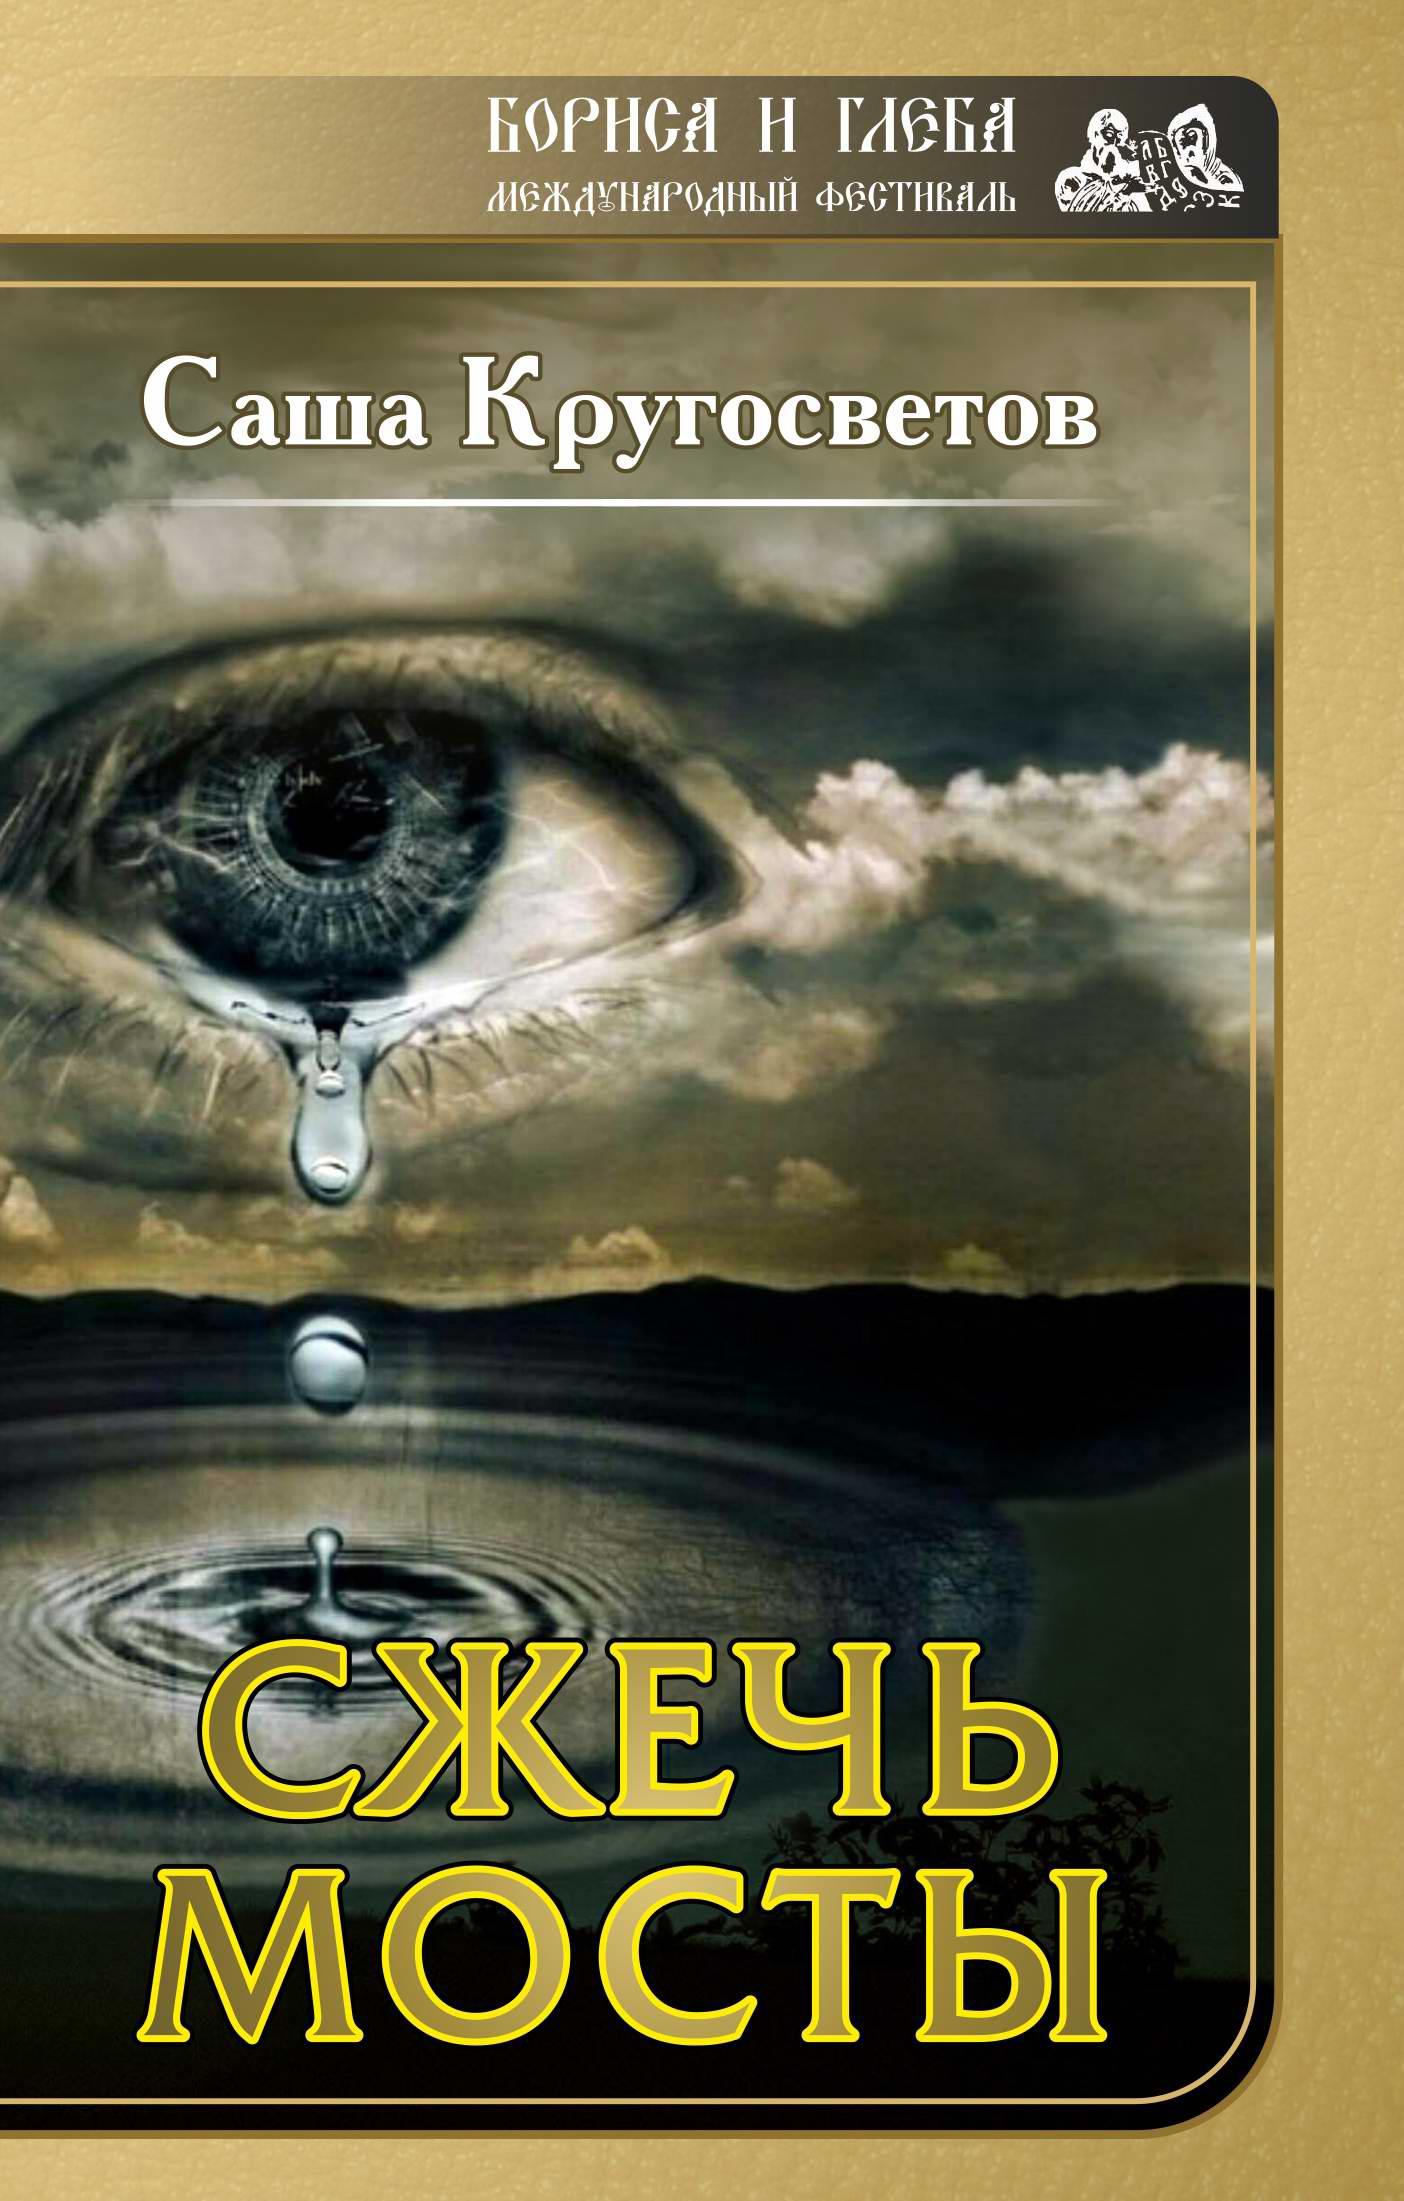 15 Zamshev Szhech